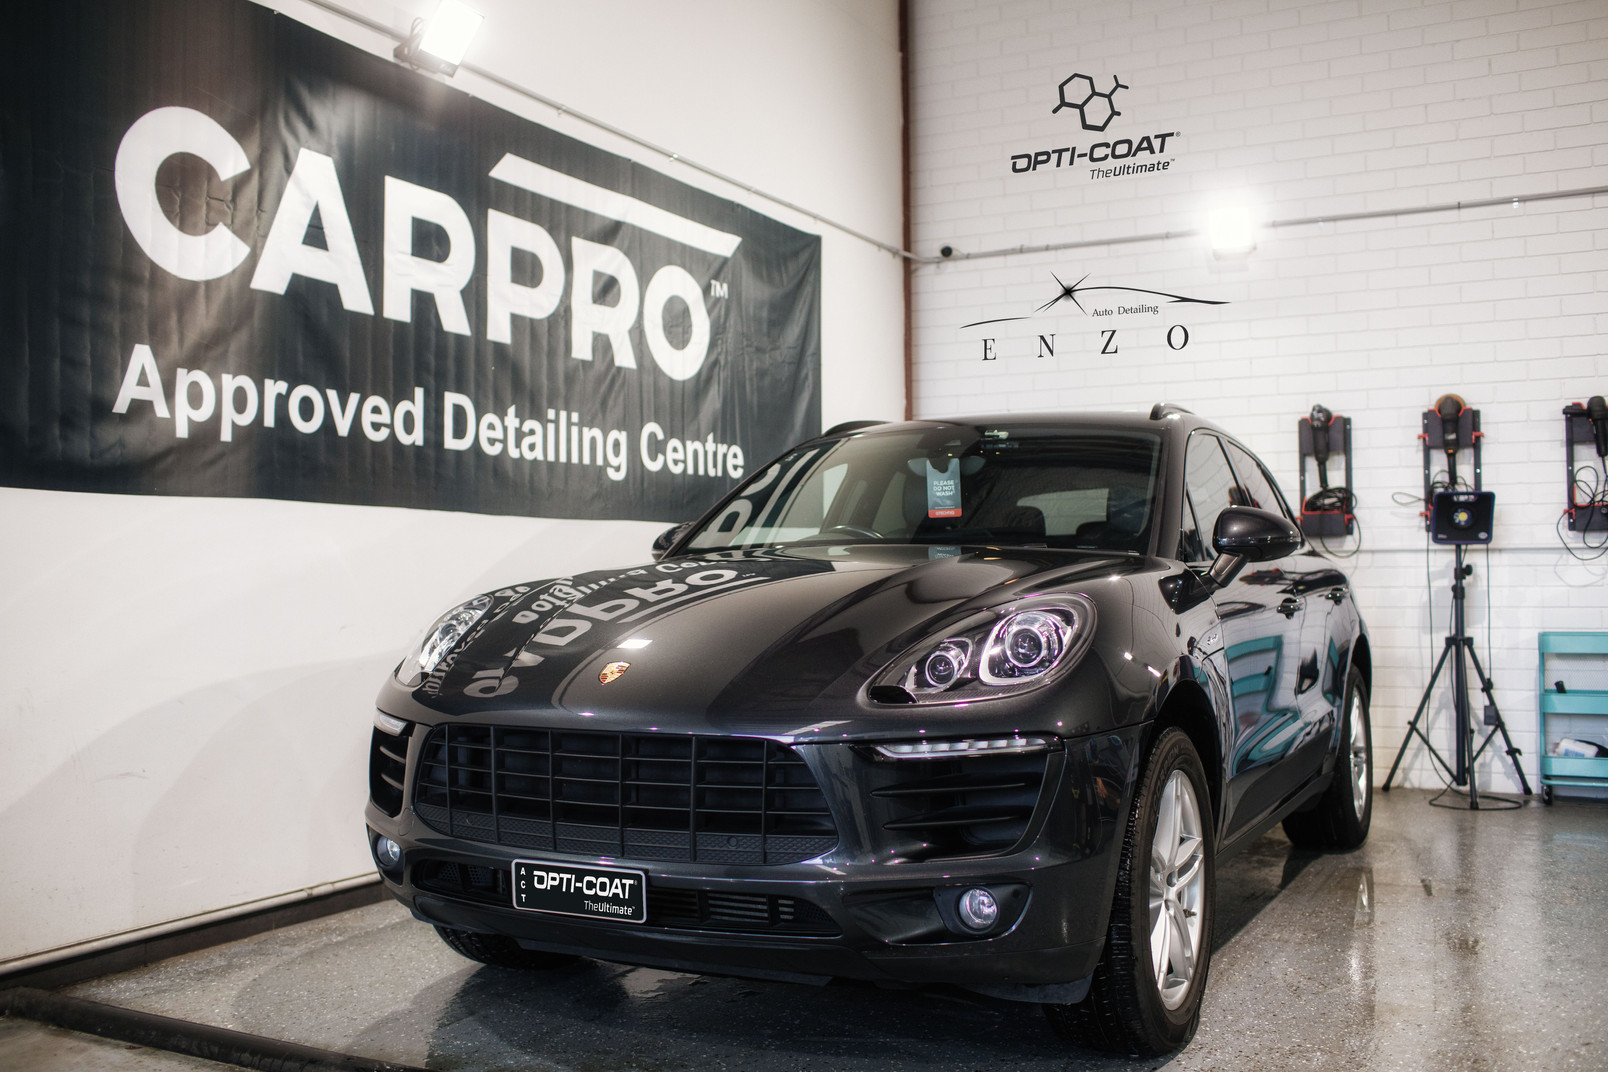 2018 Porsche MacanS - Opti-Coat Pro+